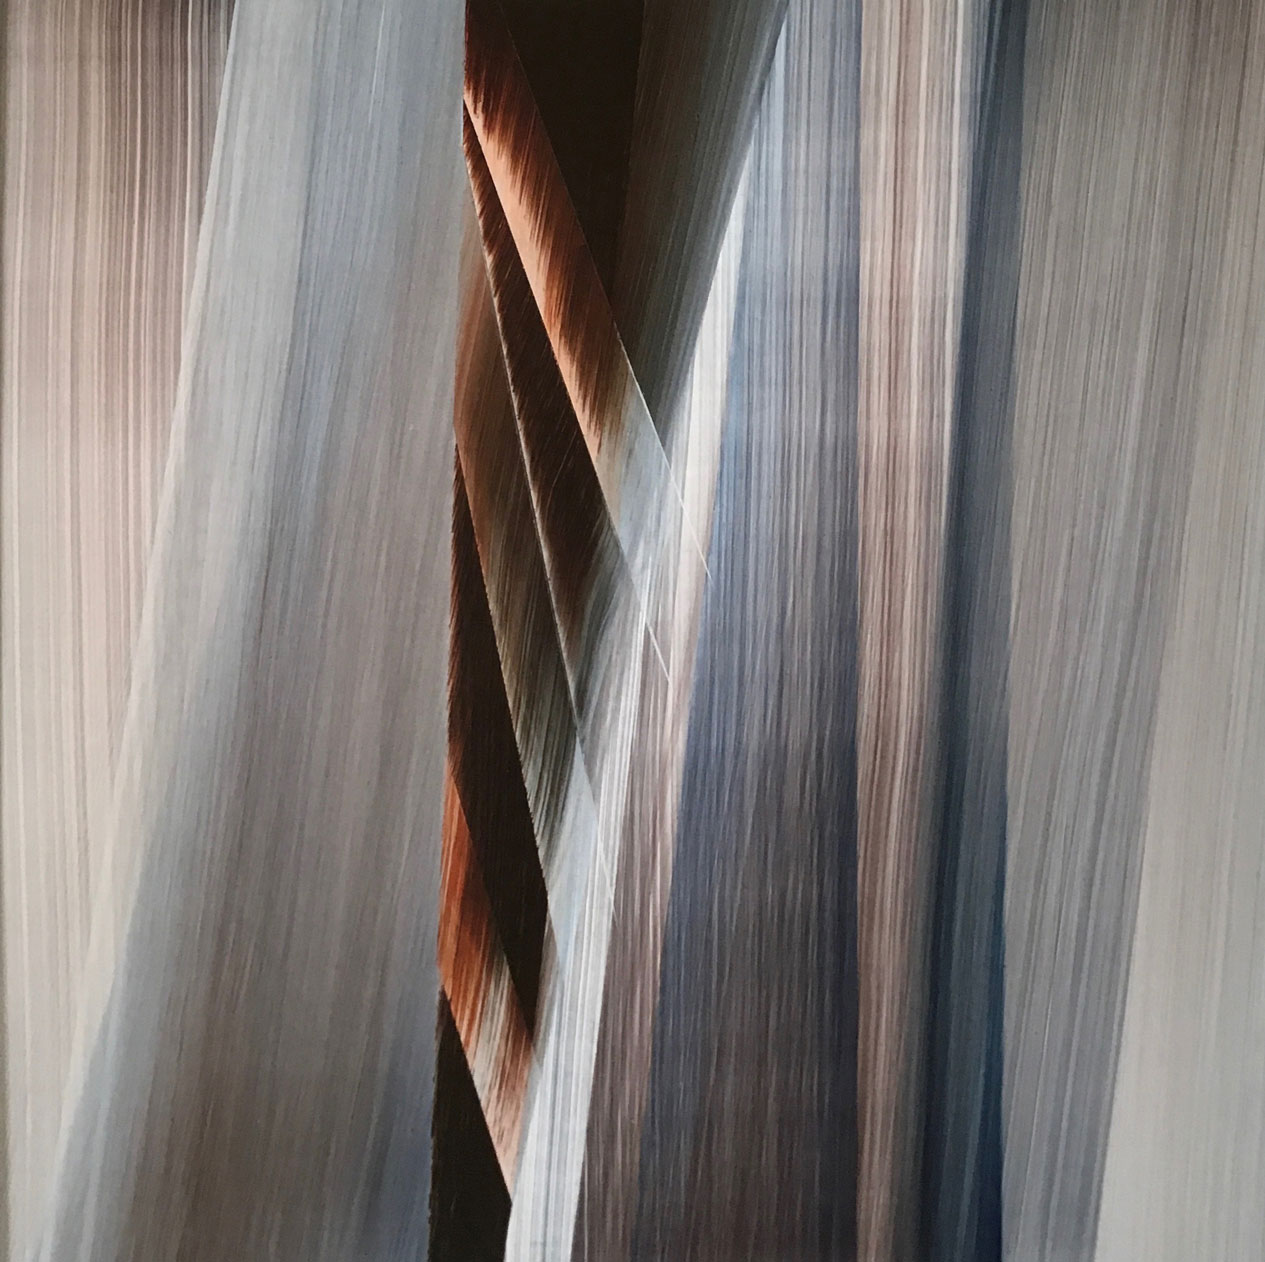 meditation-13-50x50